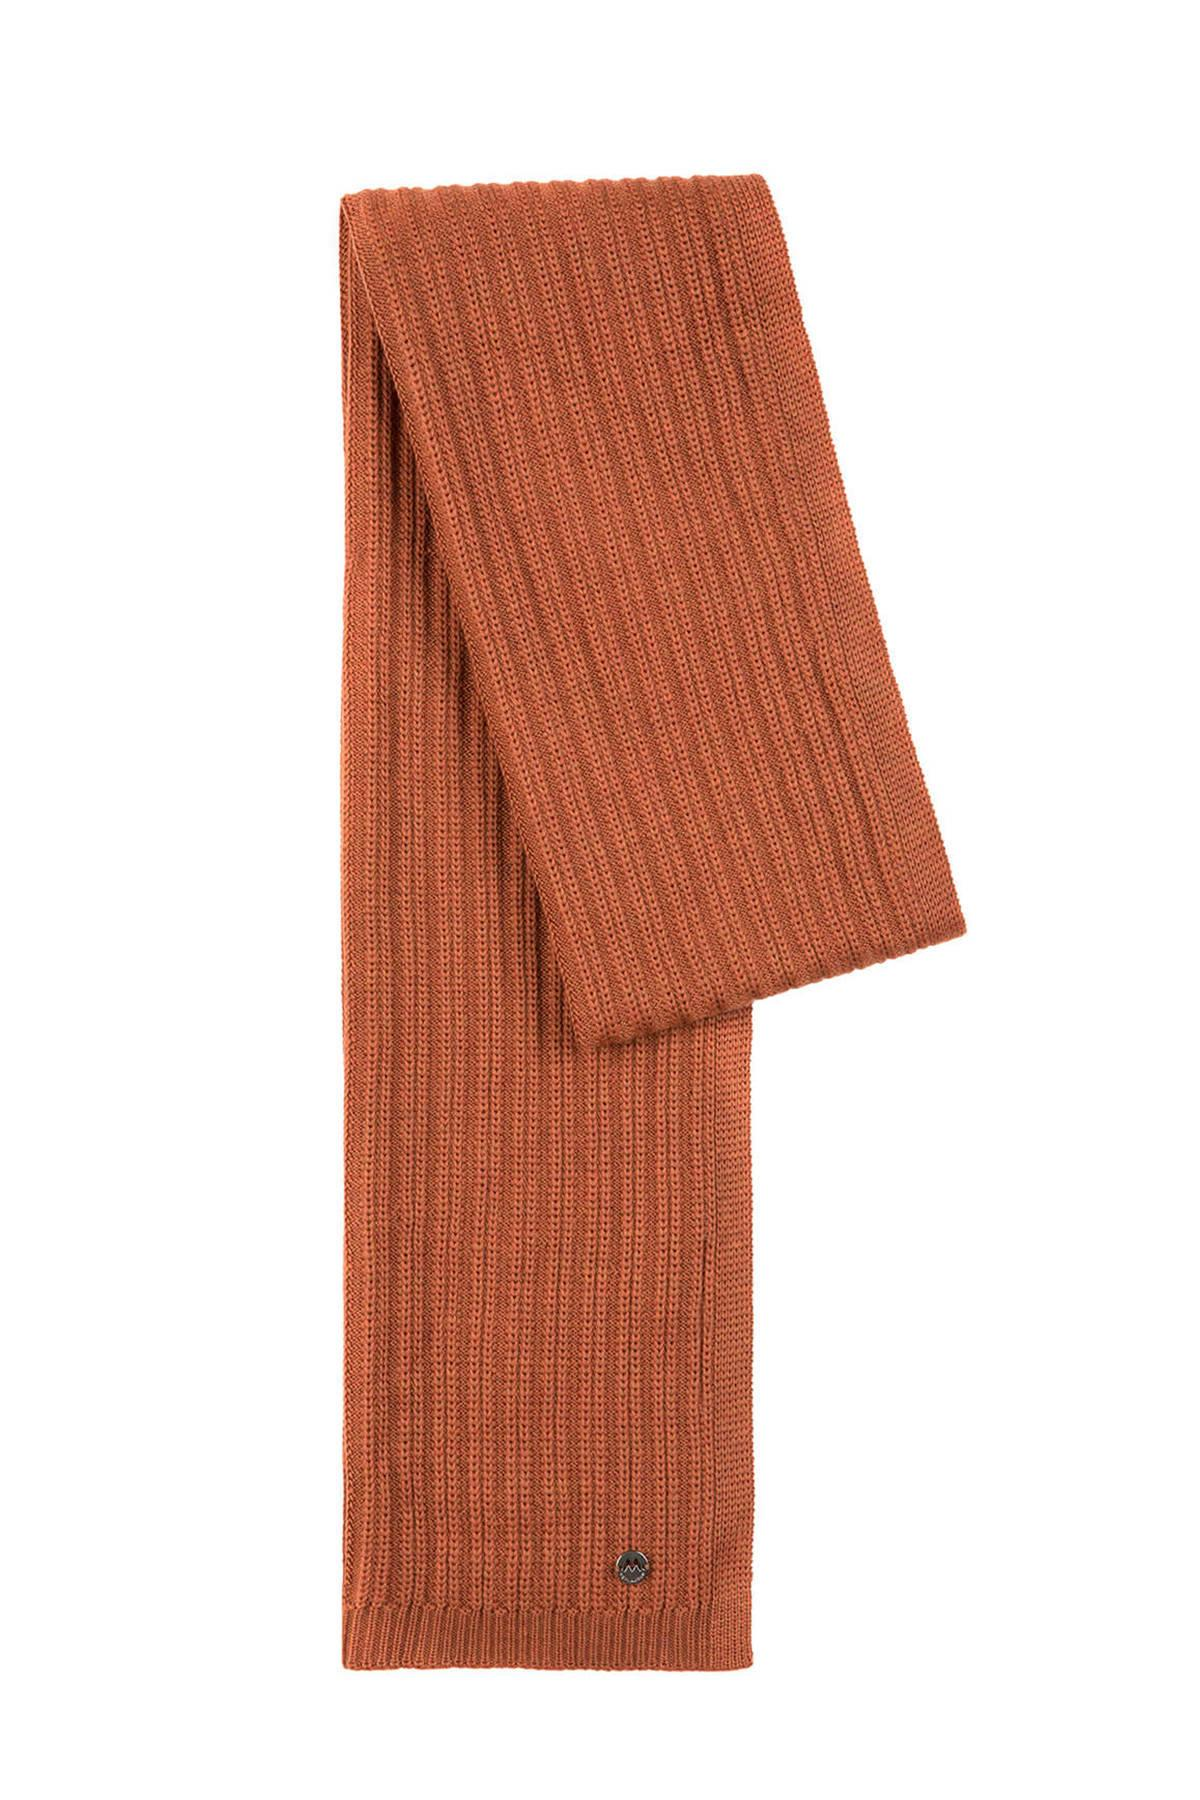 Terracotta Merino Yün Atkı